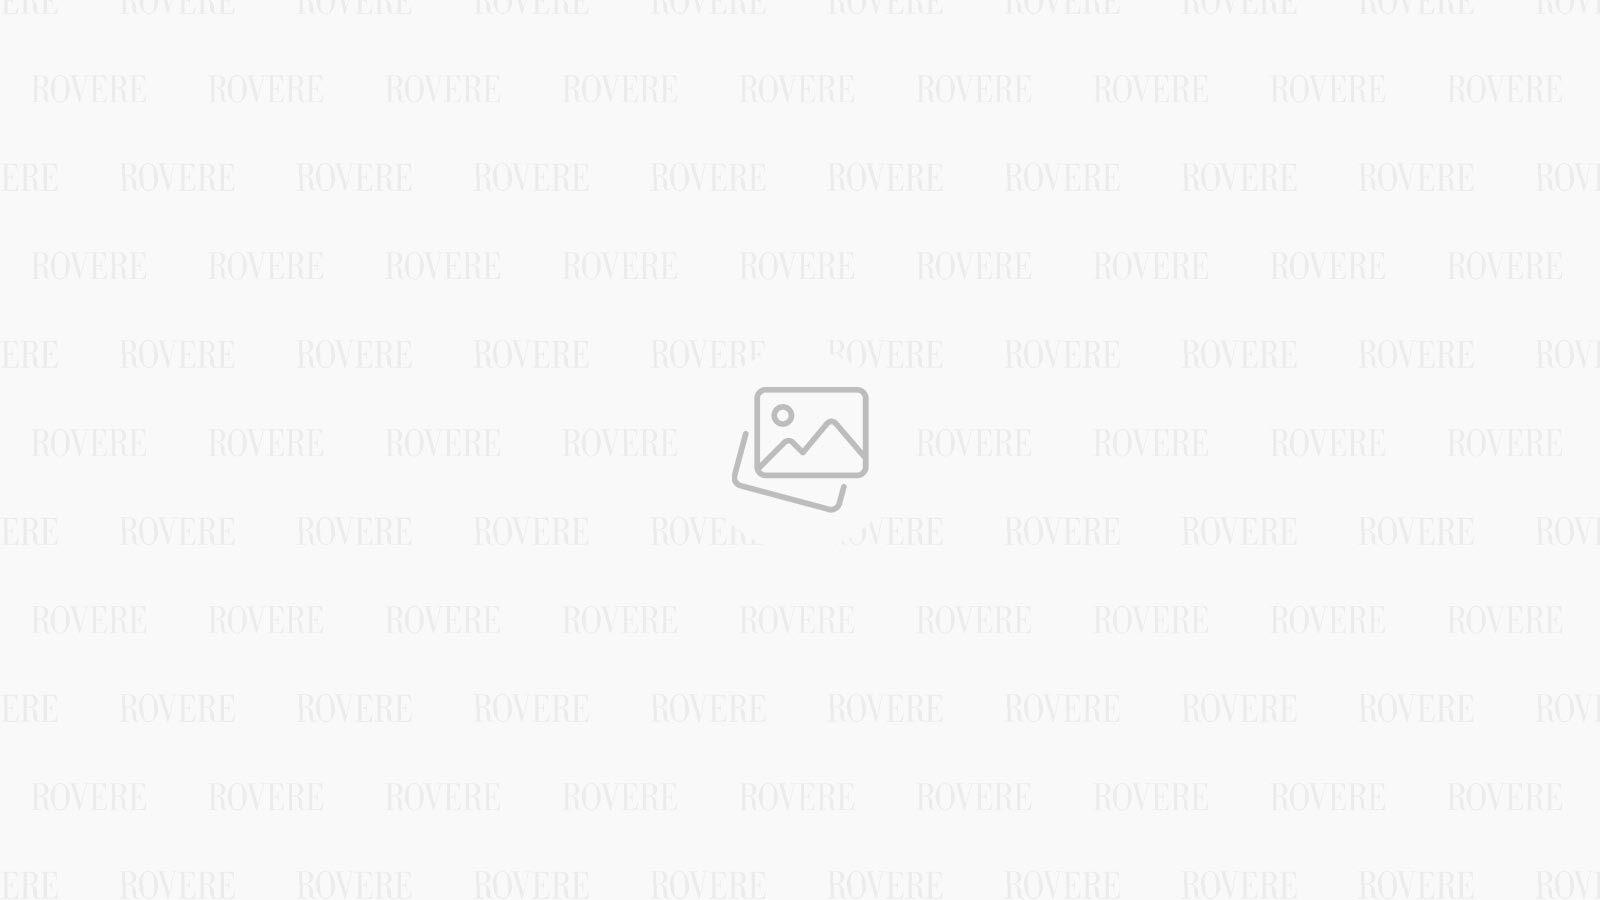 Taburet Ottowa grey velvet